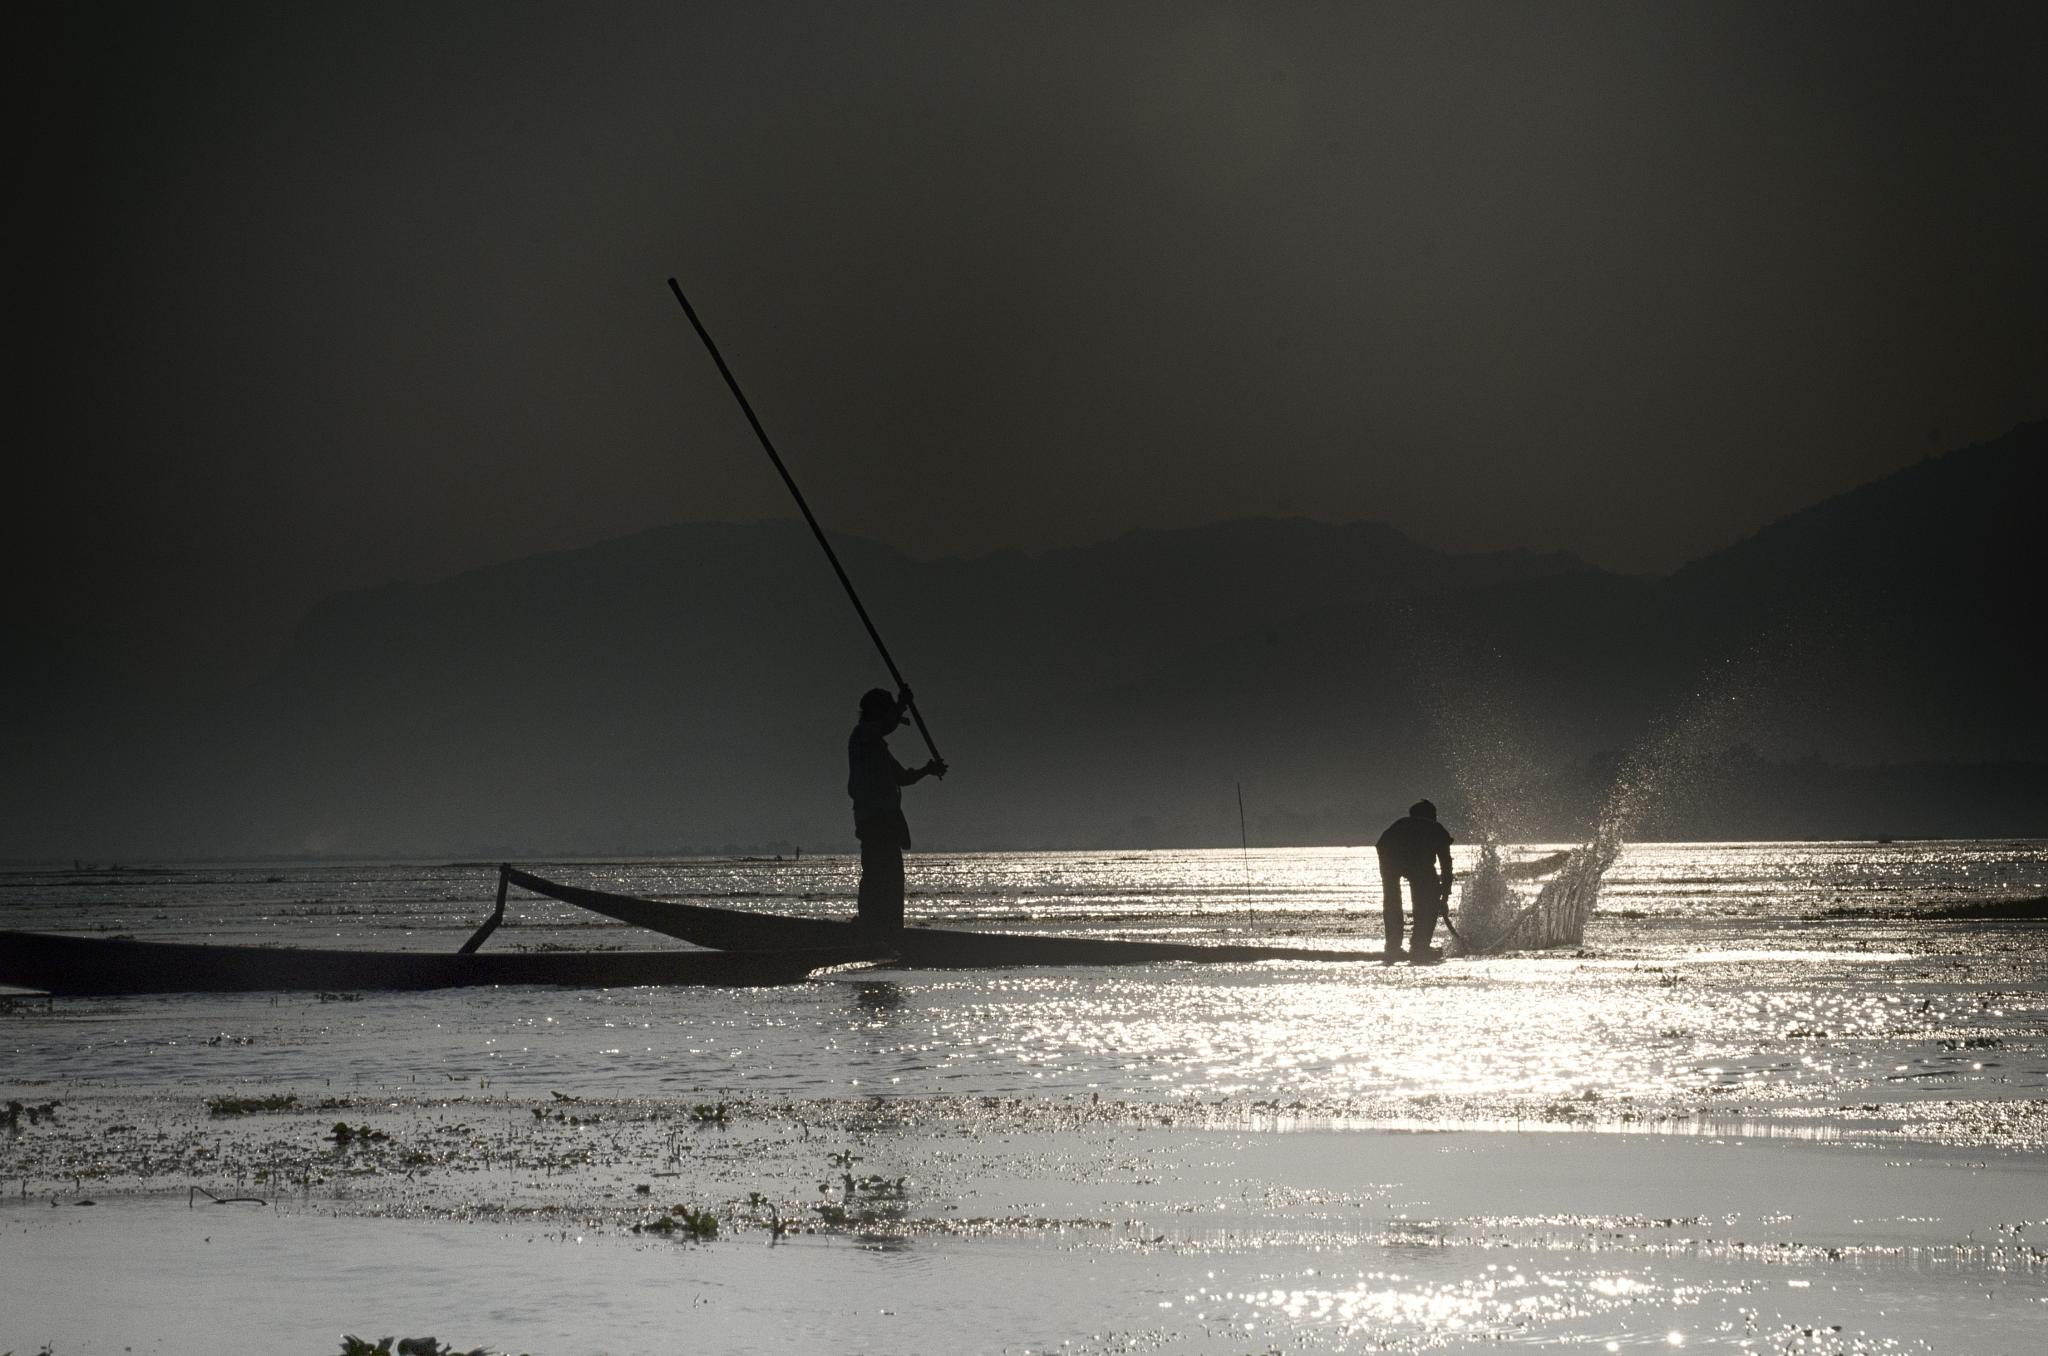 fishermen on Inlay lake, Myanmar by jeece69